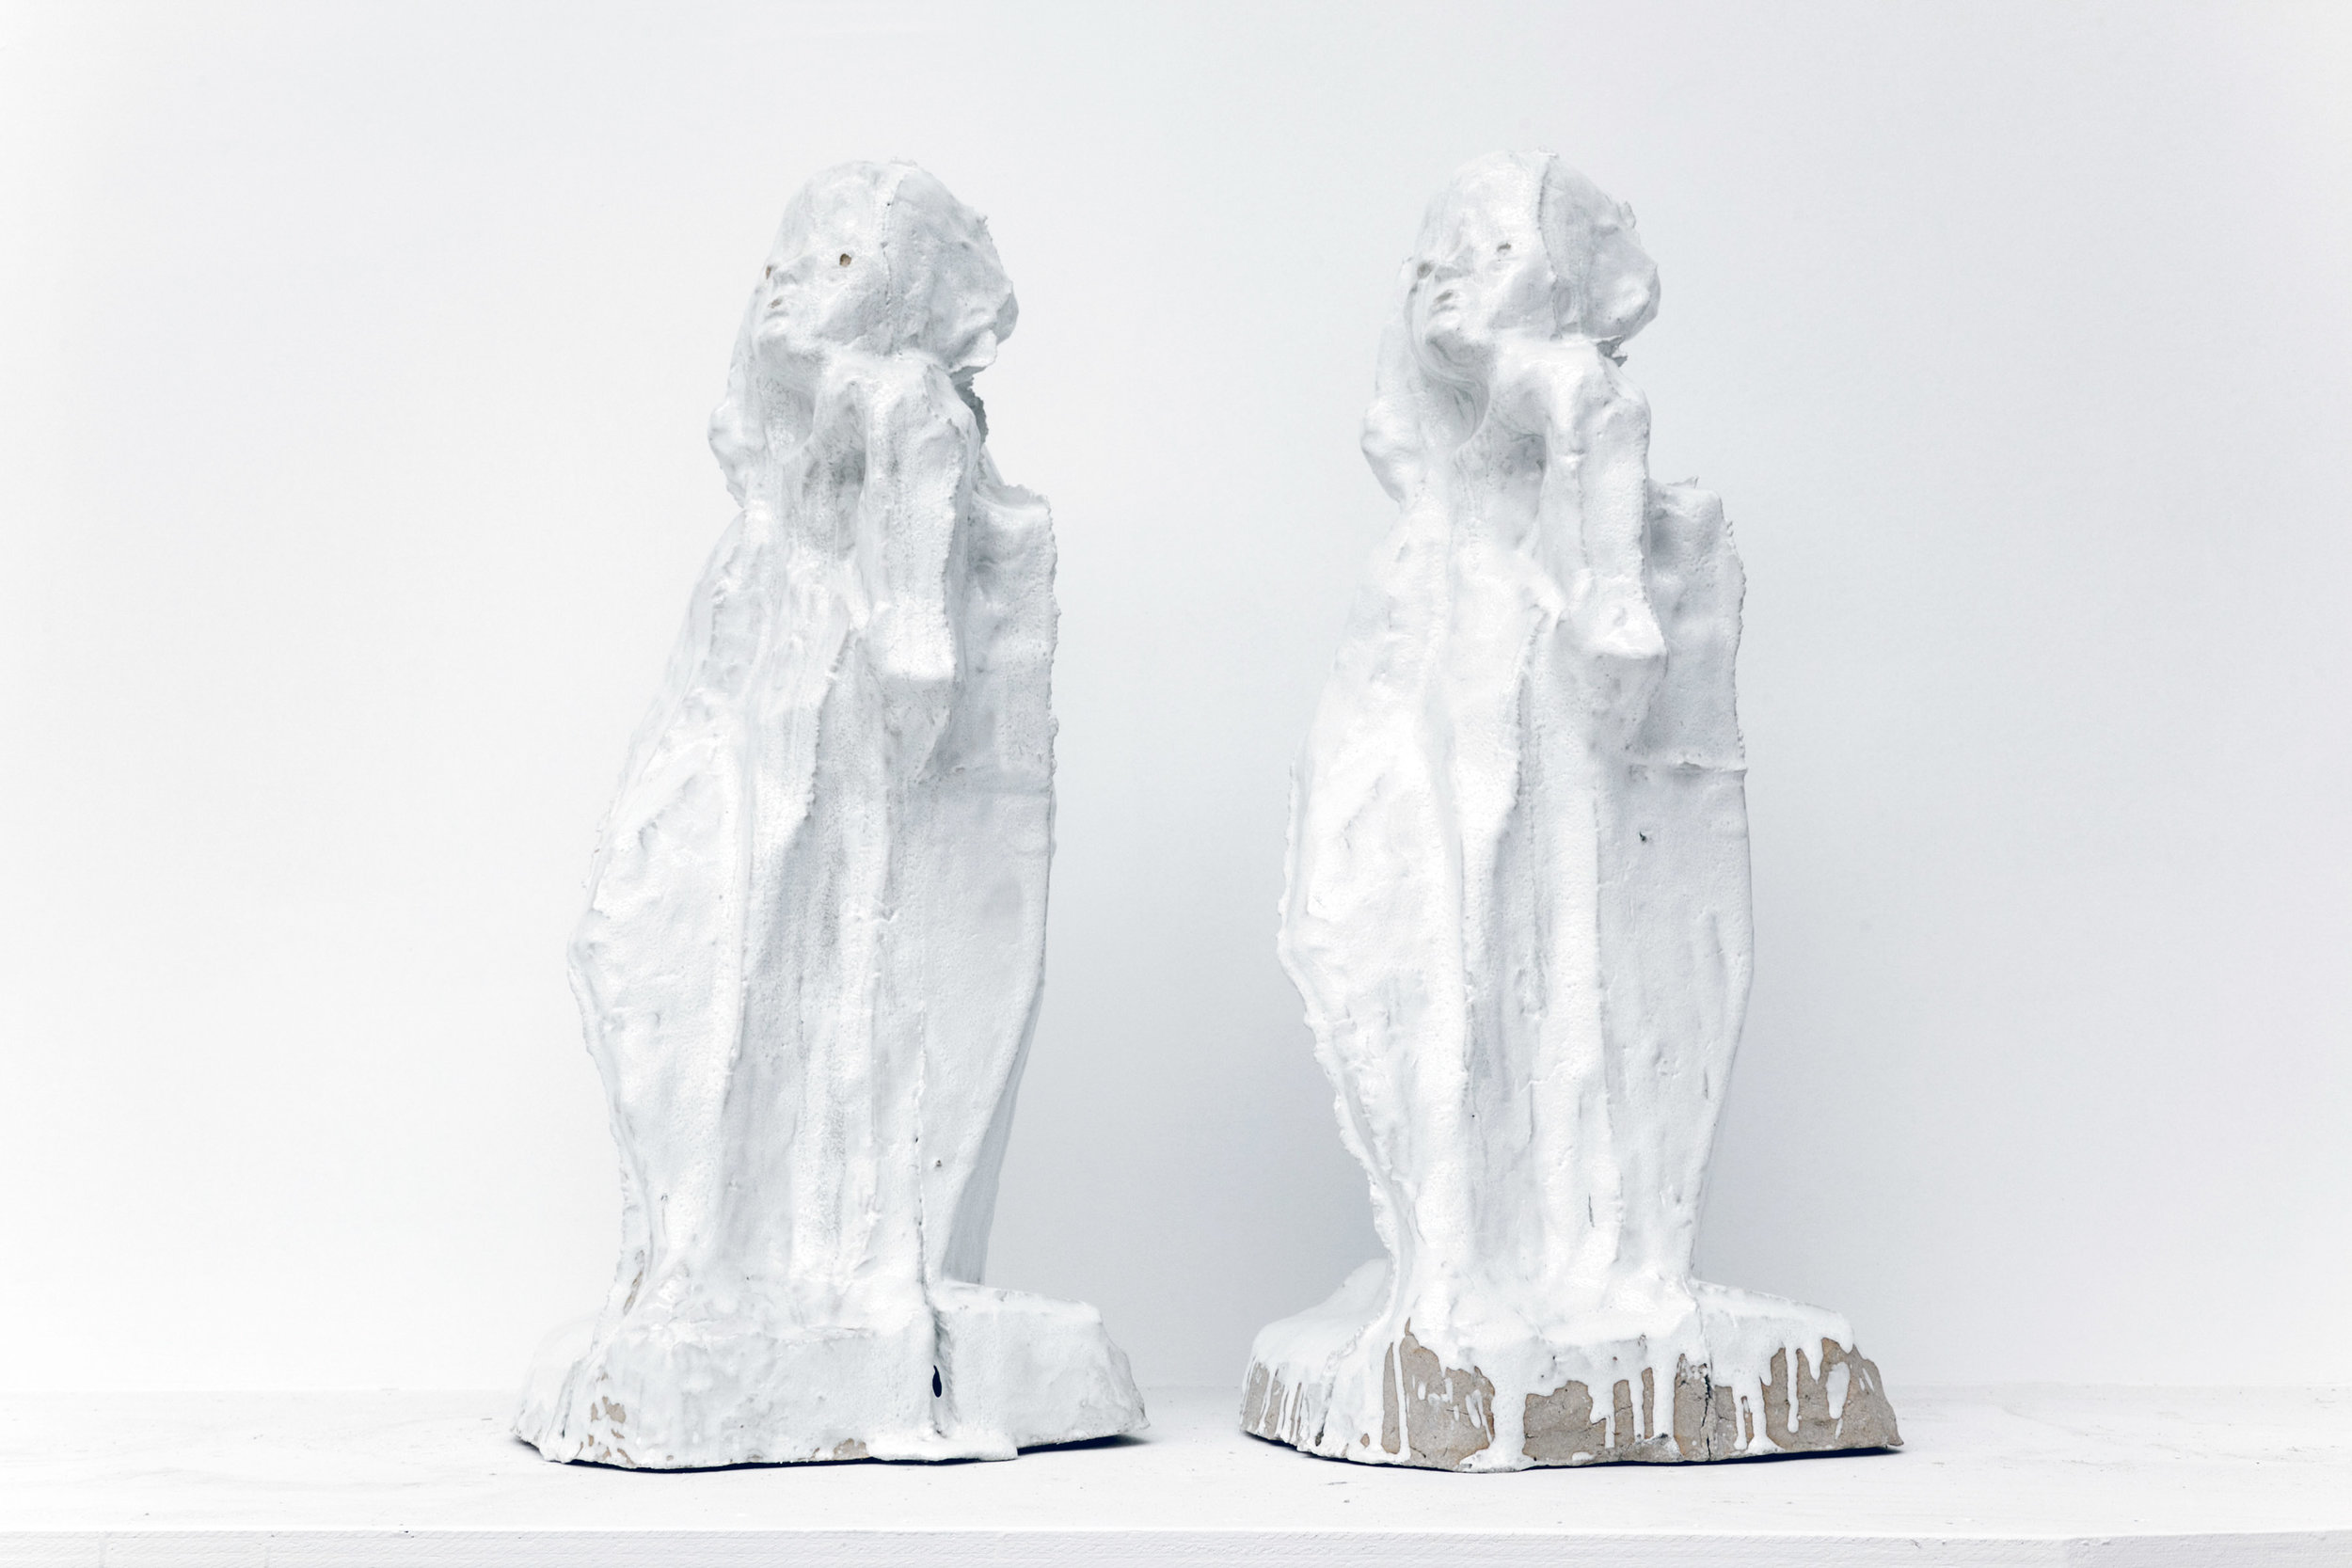 Adorant I & II, 2013-14